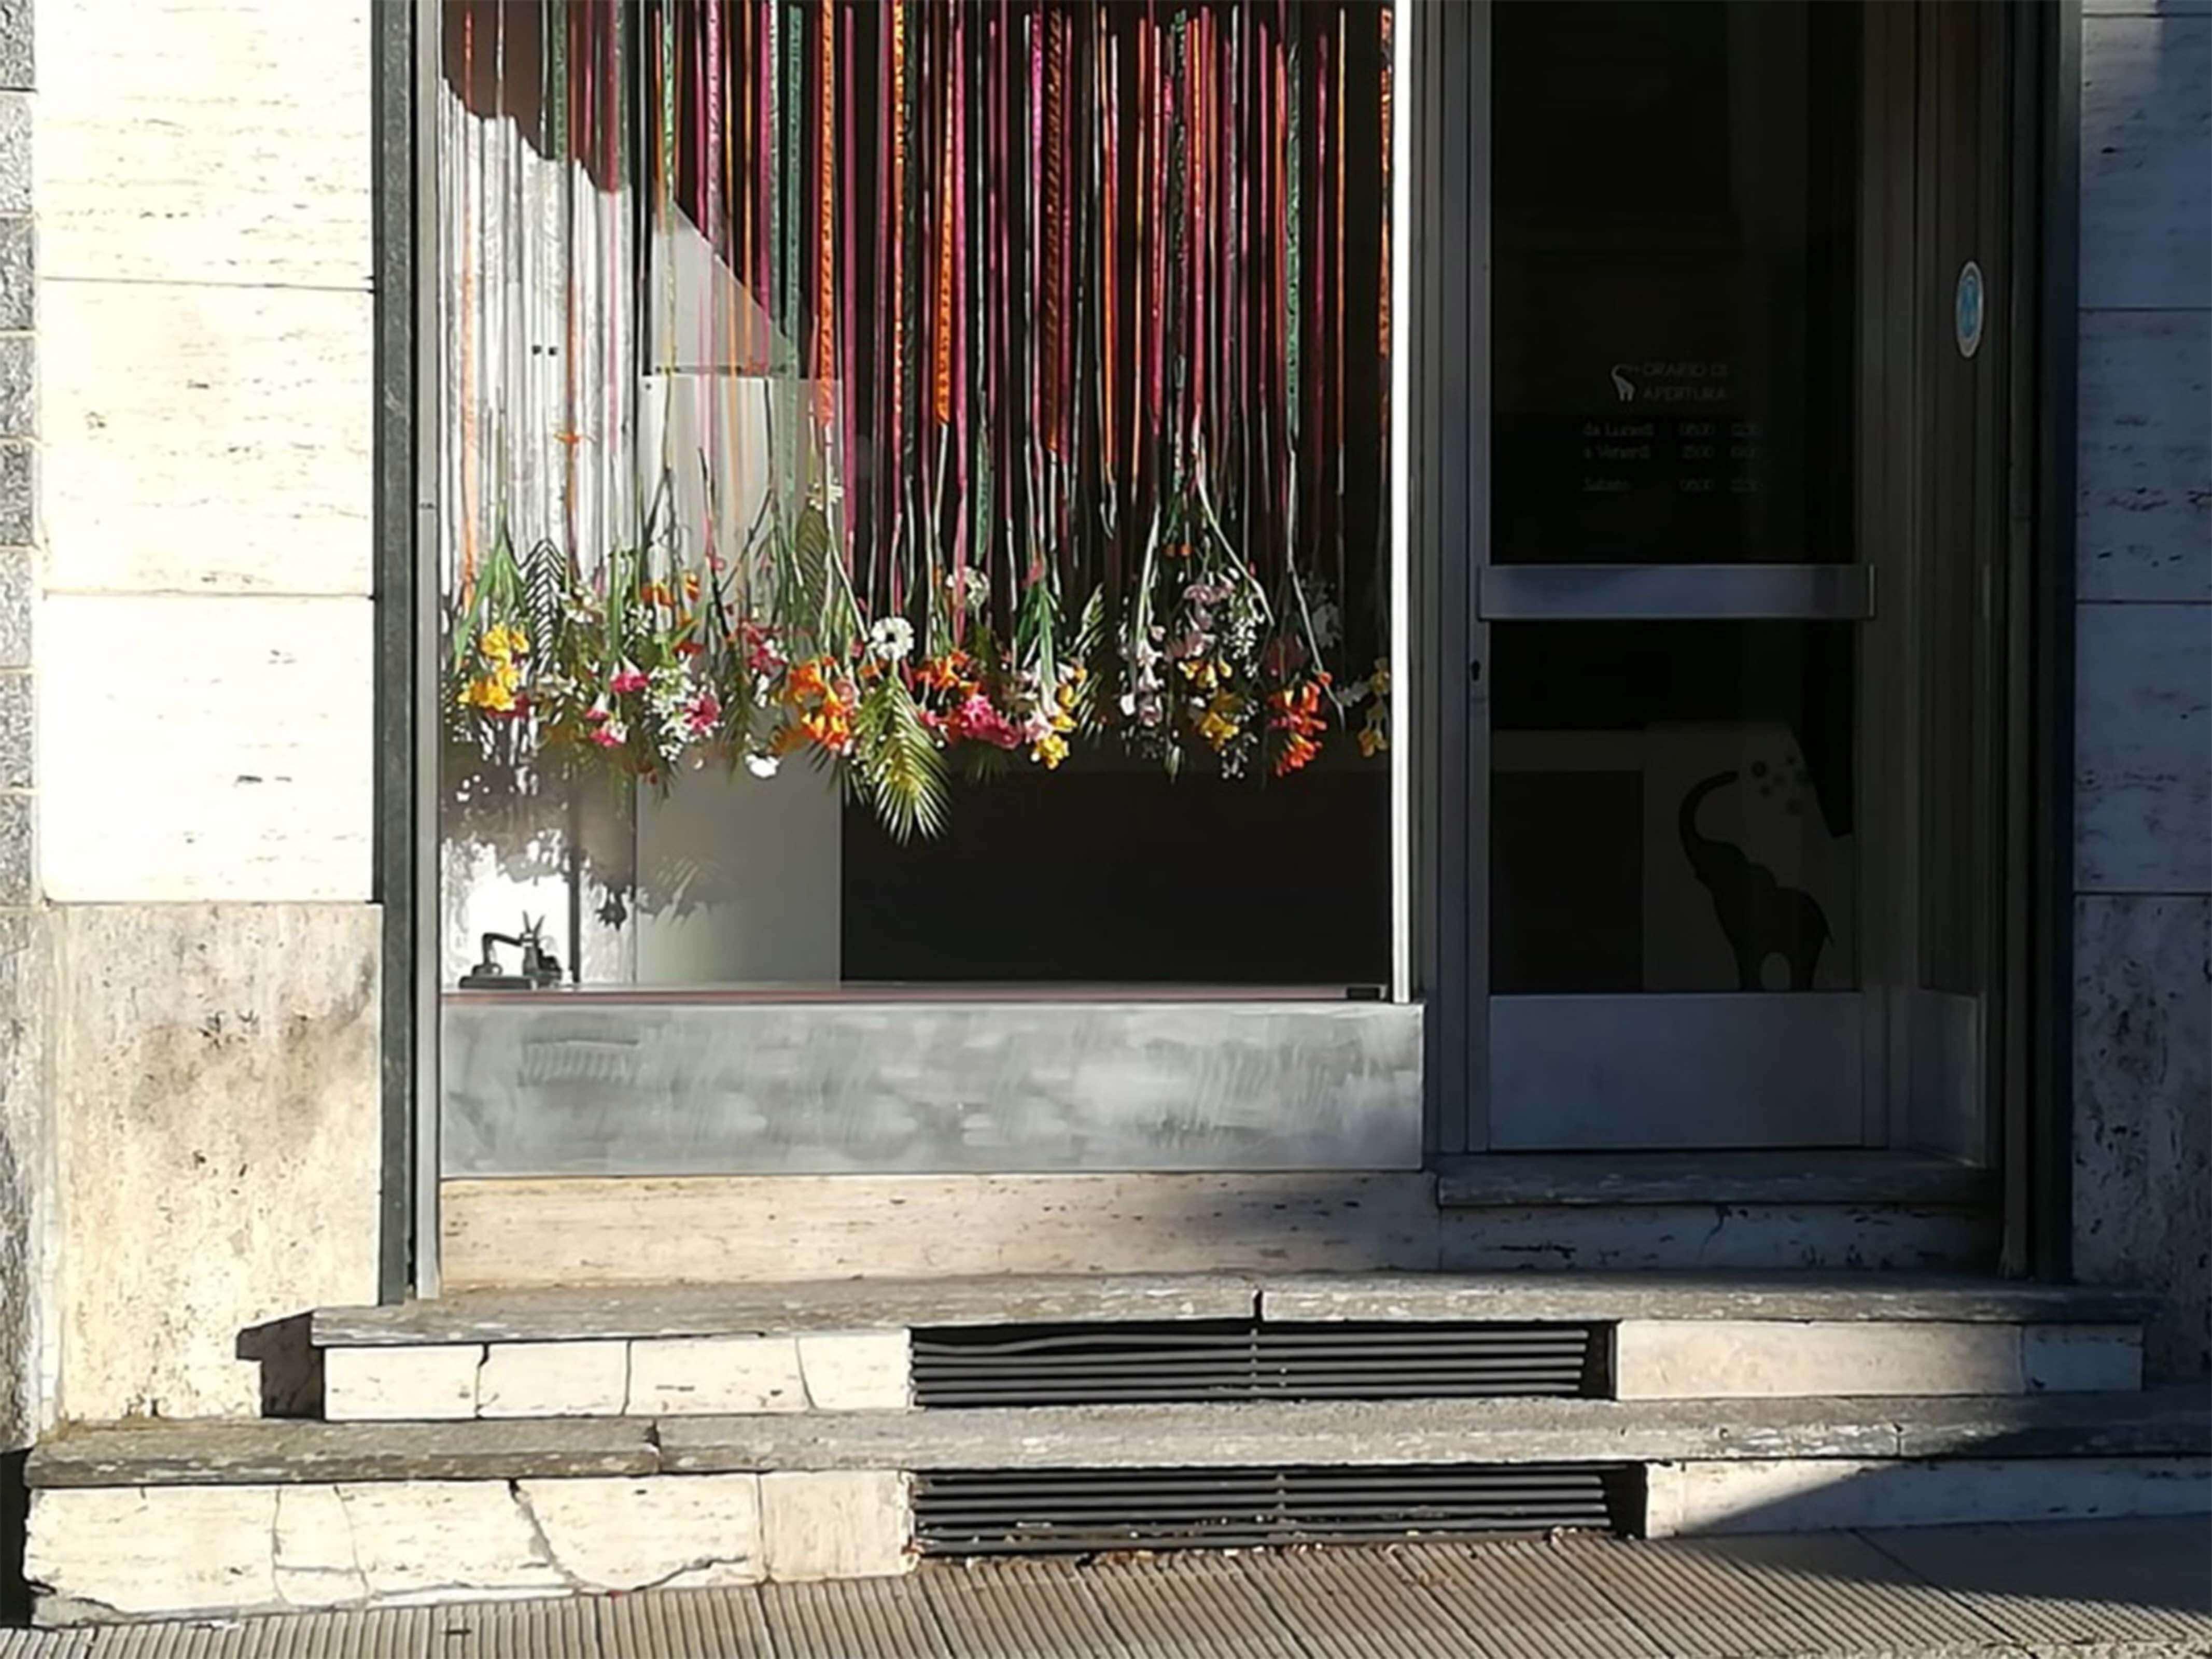 elisa_macchi_lavanderia_bombersec_dettaglio_fiori